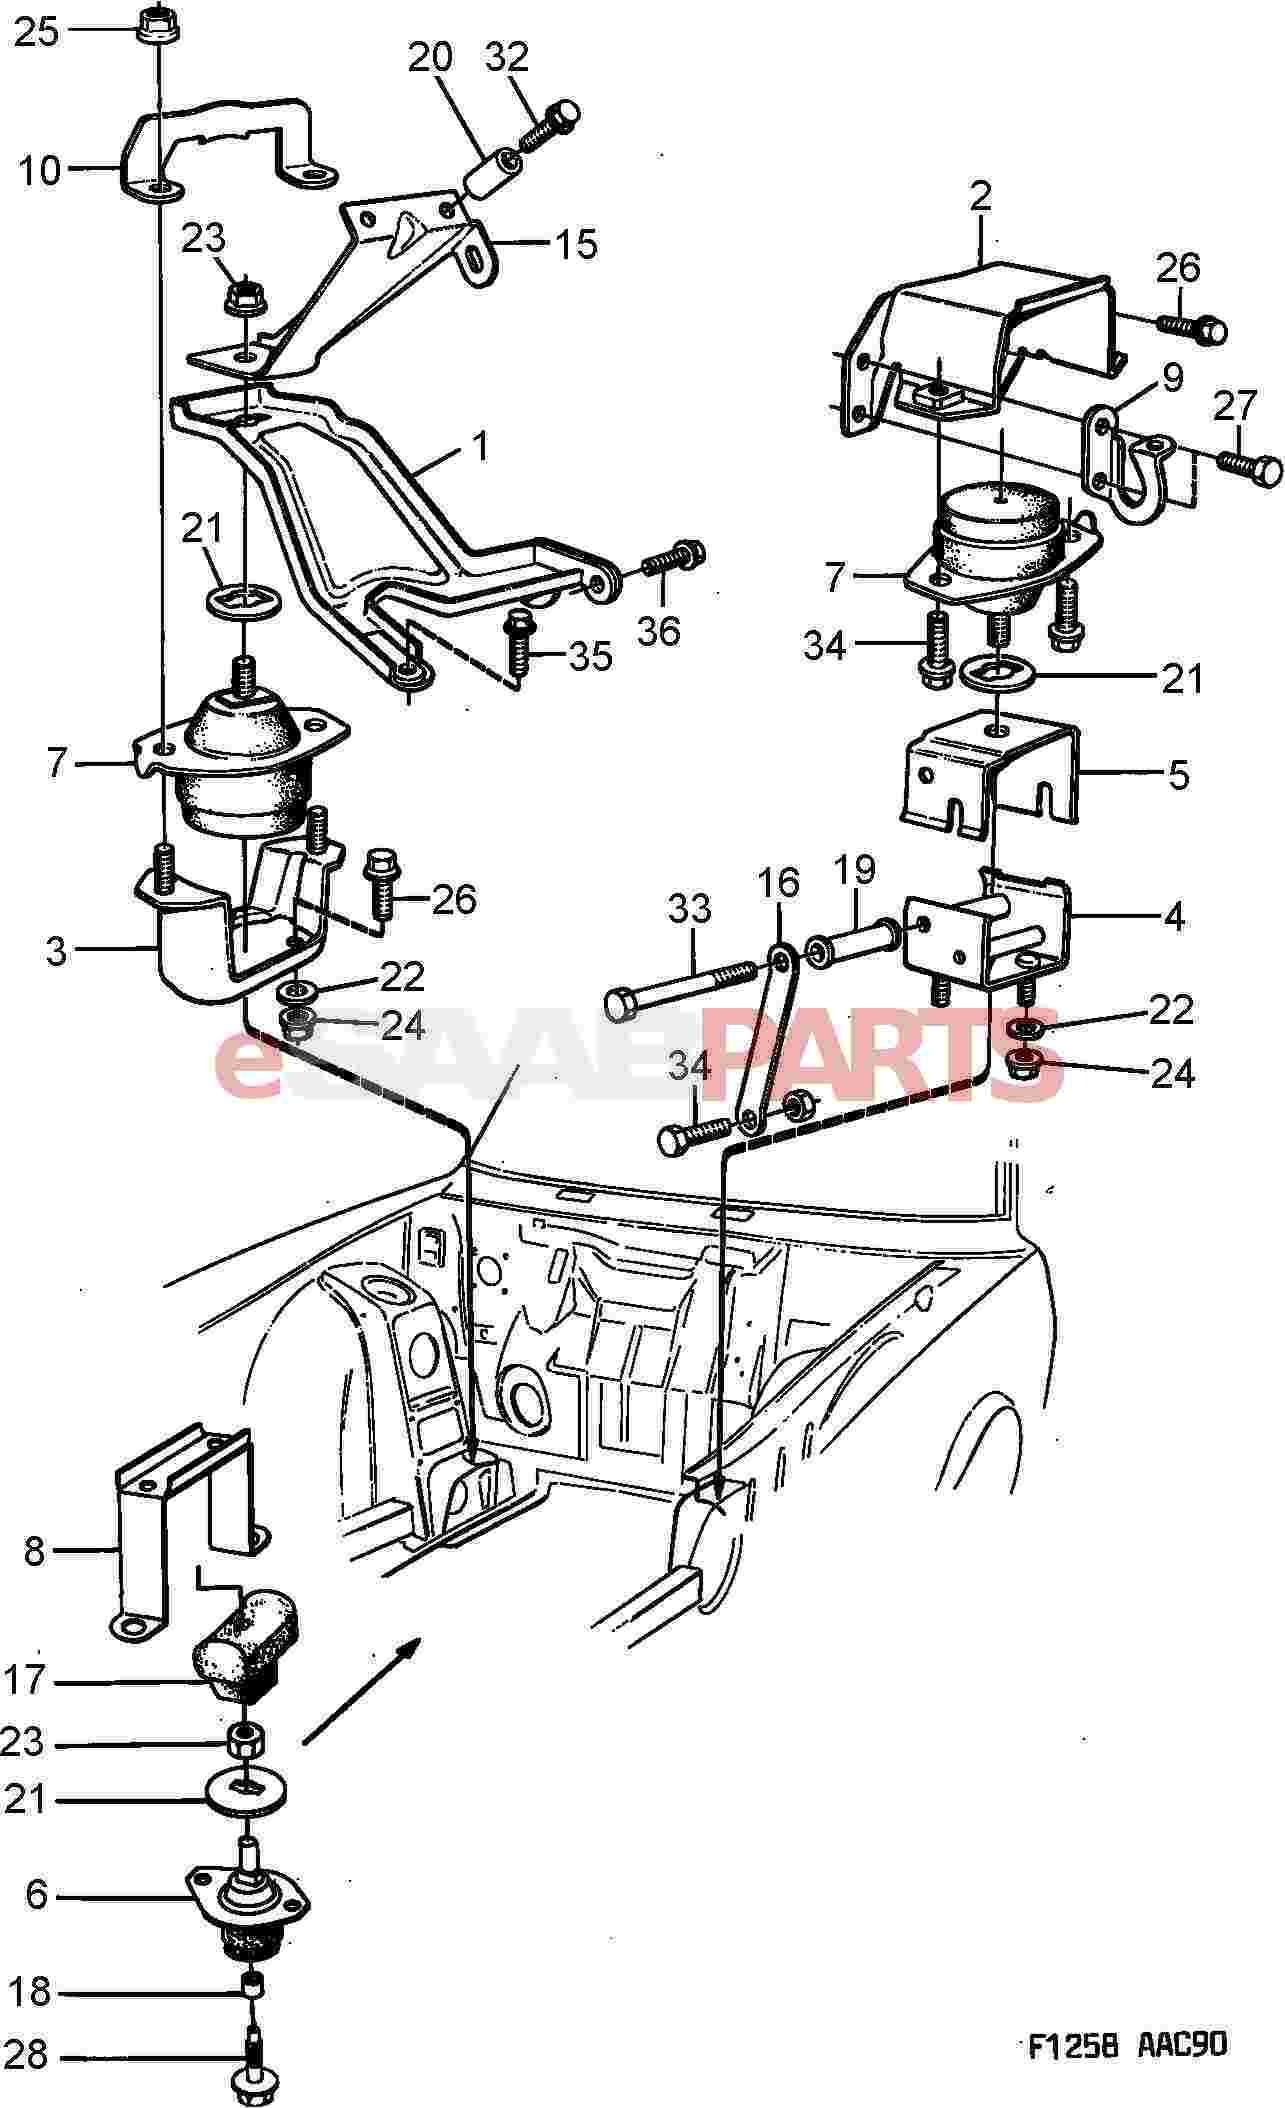 FEIPARTS 2 pieces suspension parts Front Sway Bar 99-09 for Saab 42983 01-02 for Saturn L100 01-03 for L200 01-05 for L300 00 for LS LS1 LS2 00 for LW1 00 for LW2 01-03 for LW200 01-03 for LW300